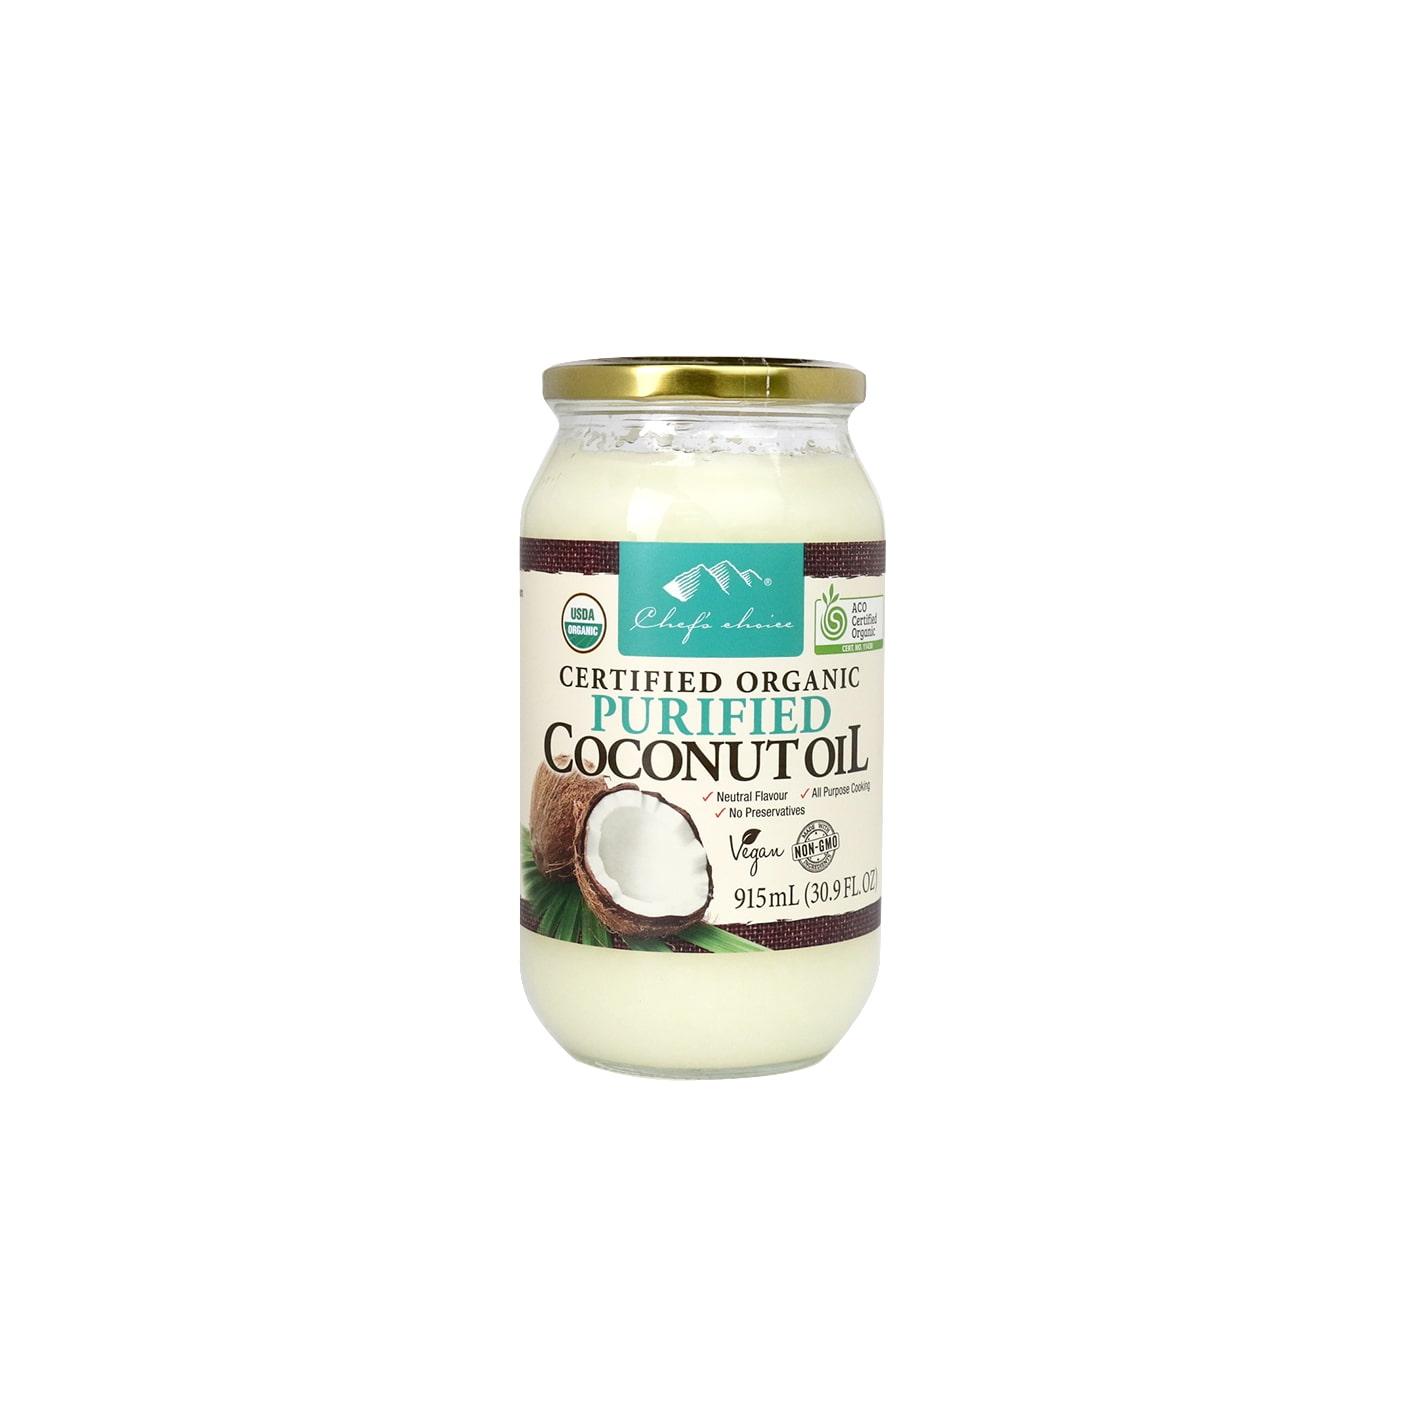 Organic Purified Coconut Oil 915mL